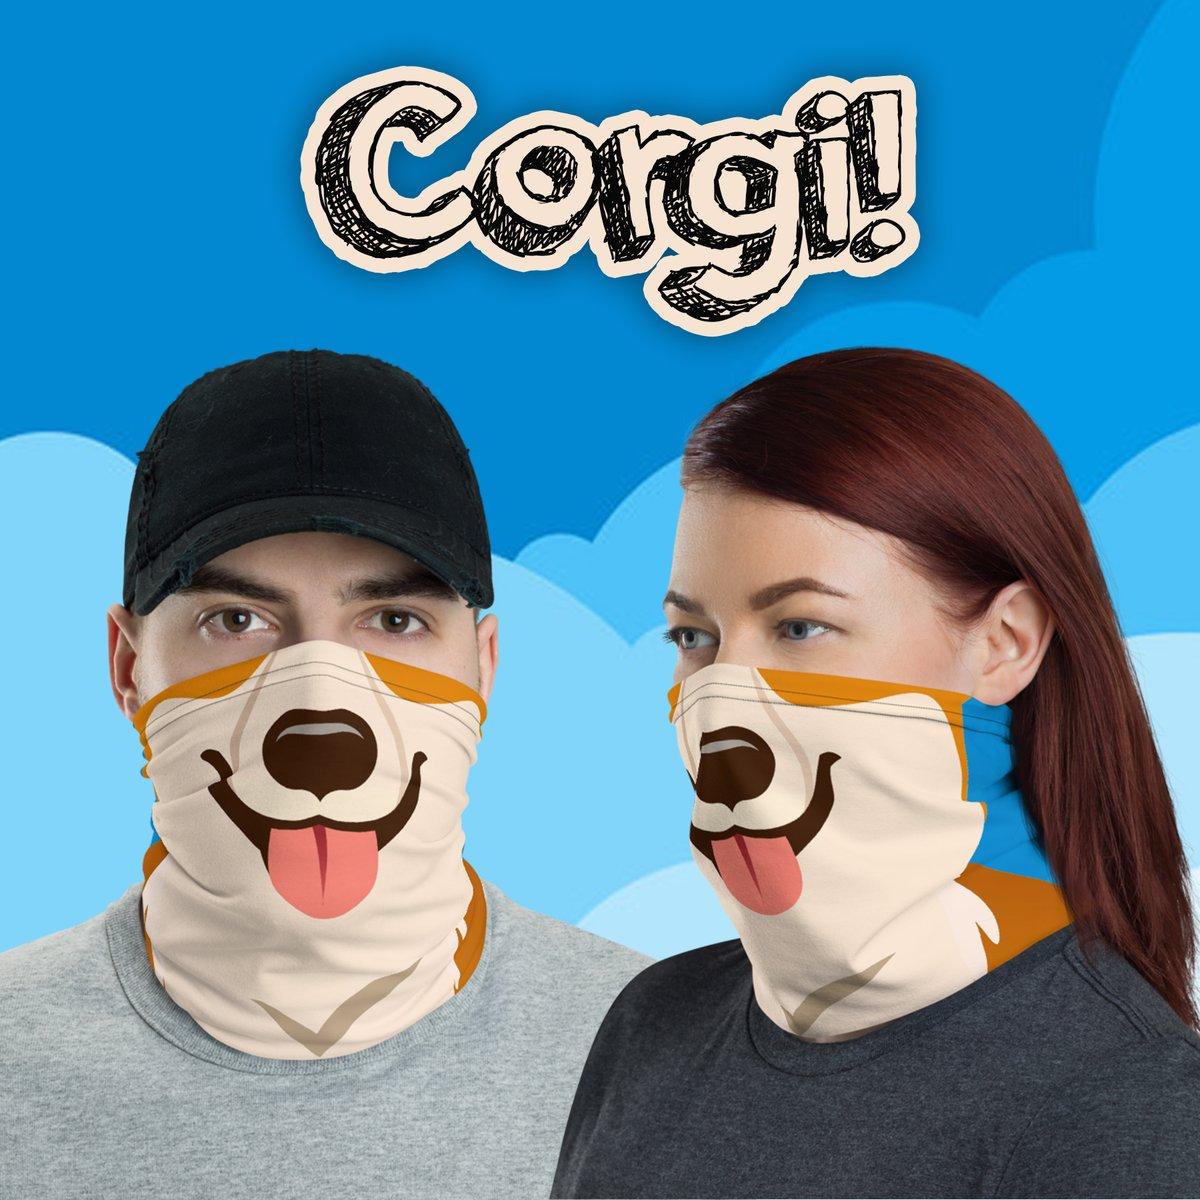 Corgi!